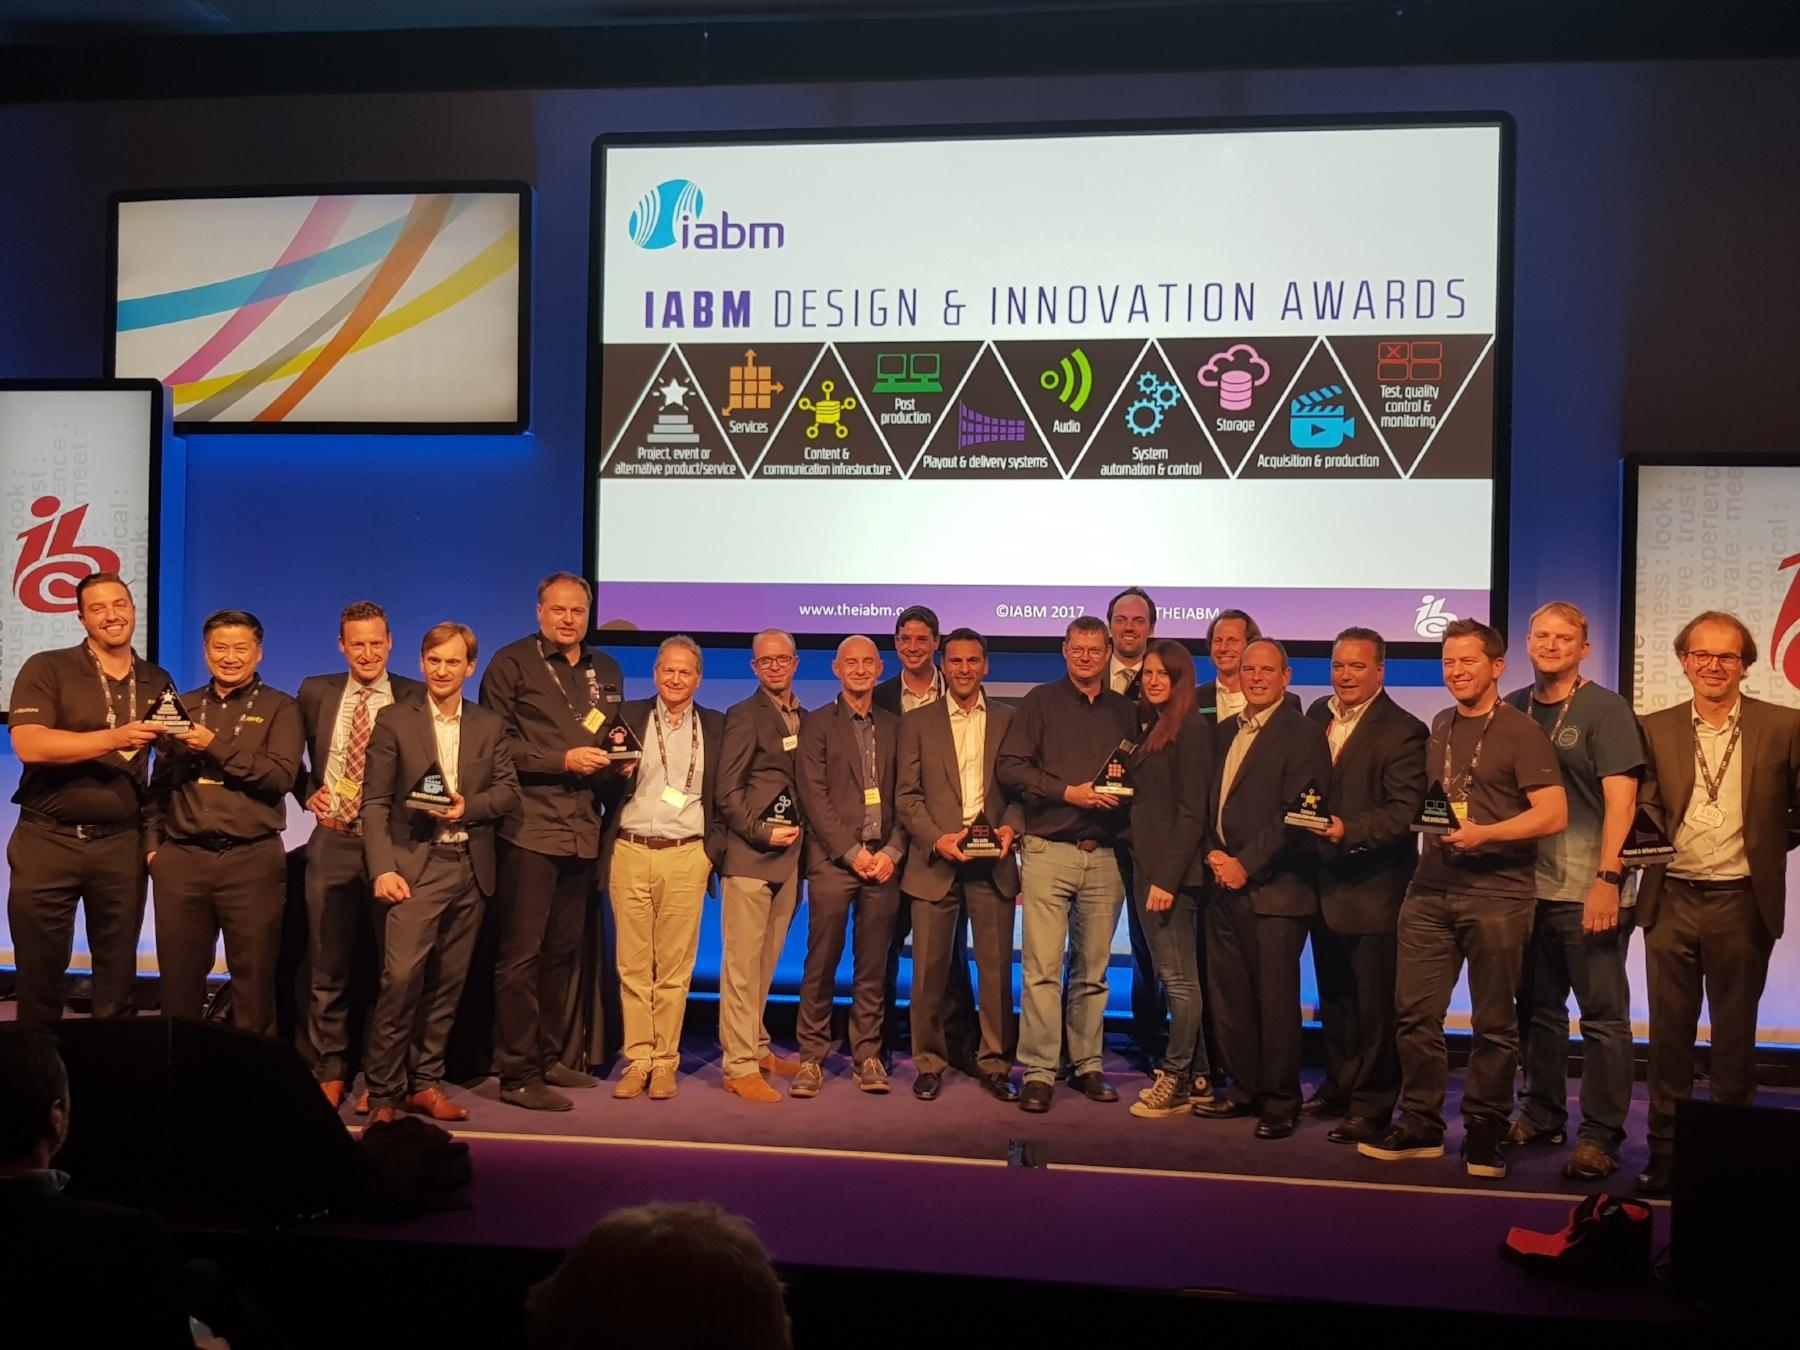 IABM Awards – IBC 2017